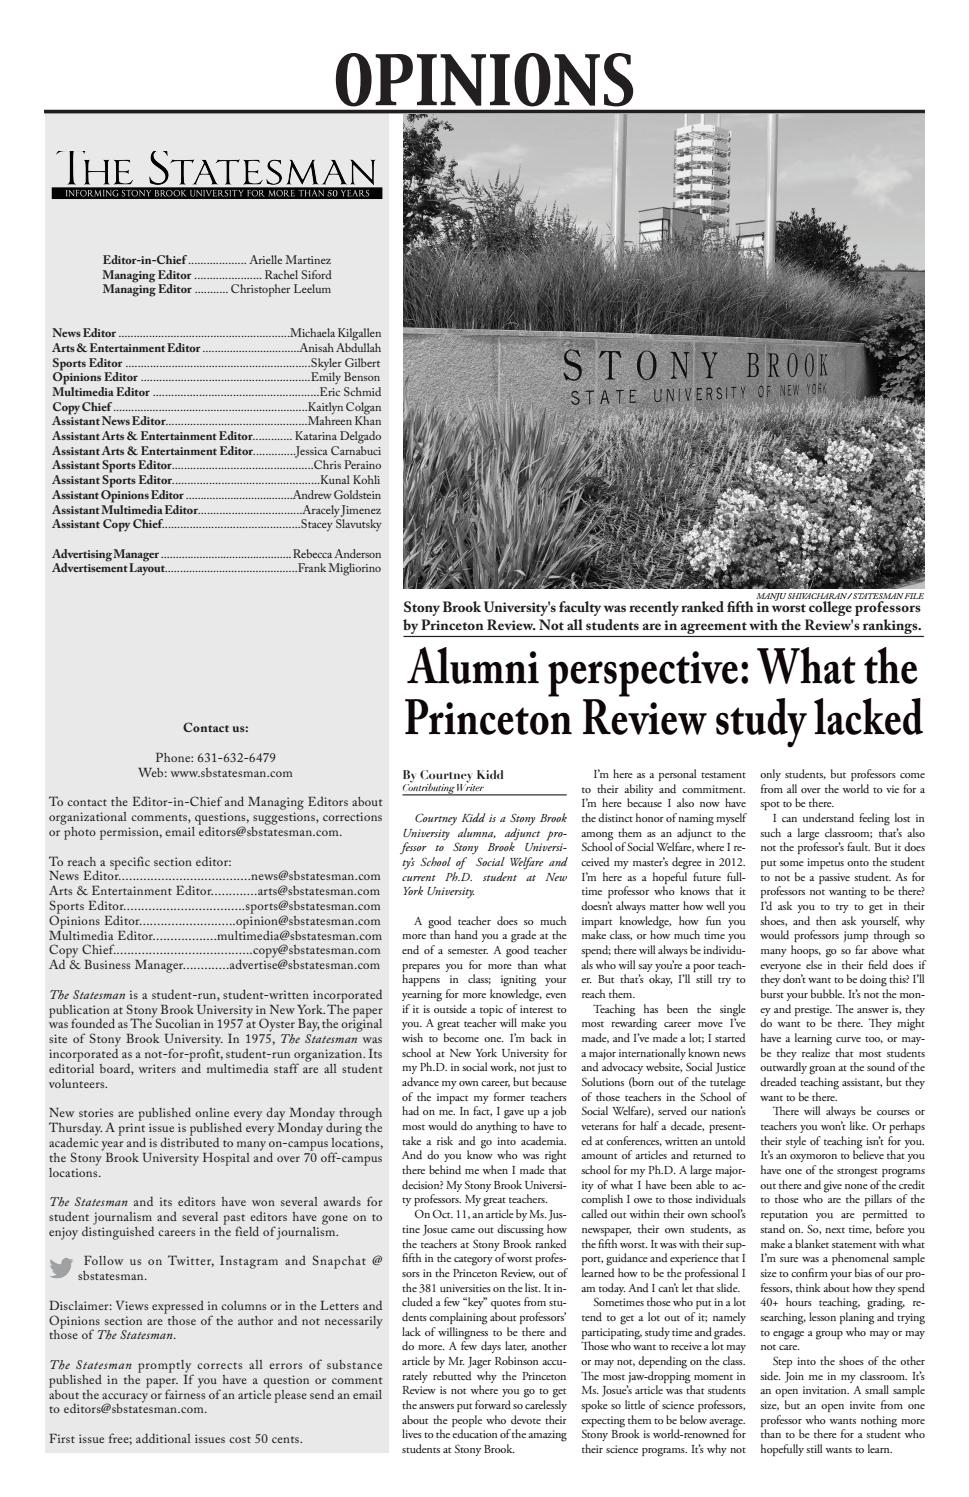 The Statesman 11-7-16 by The Statesman - issuu